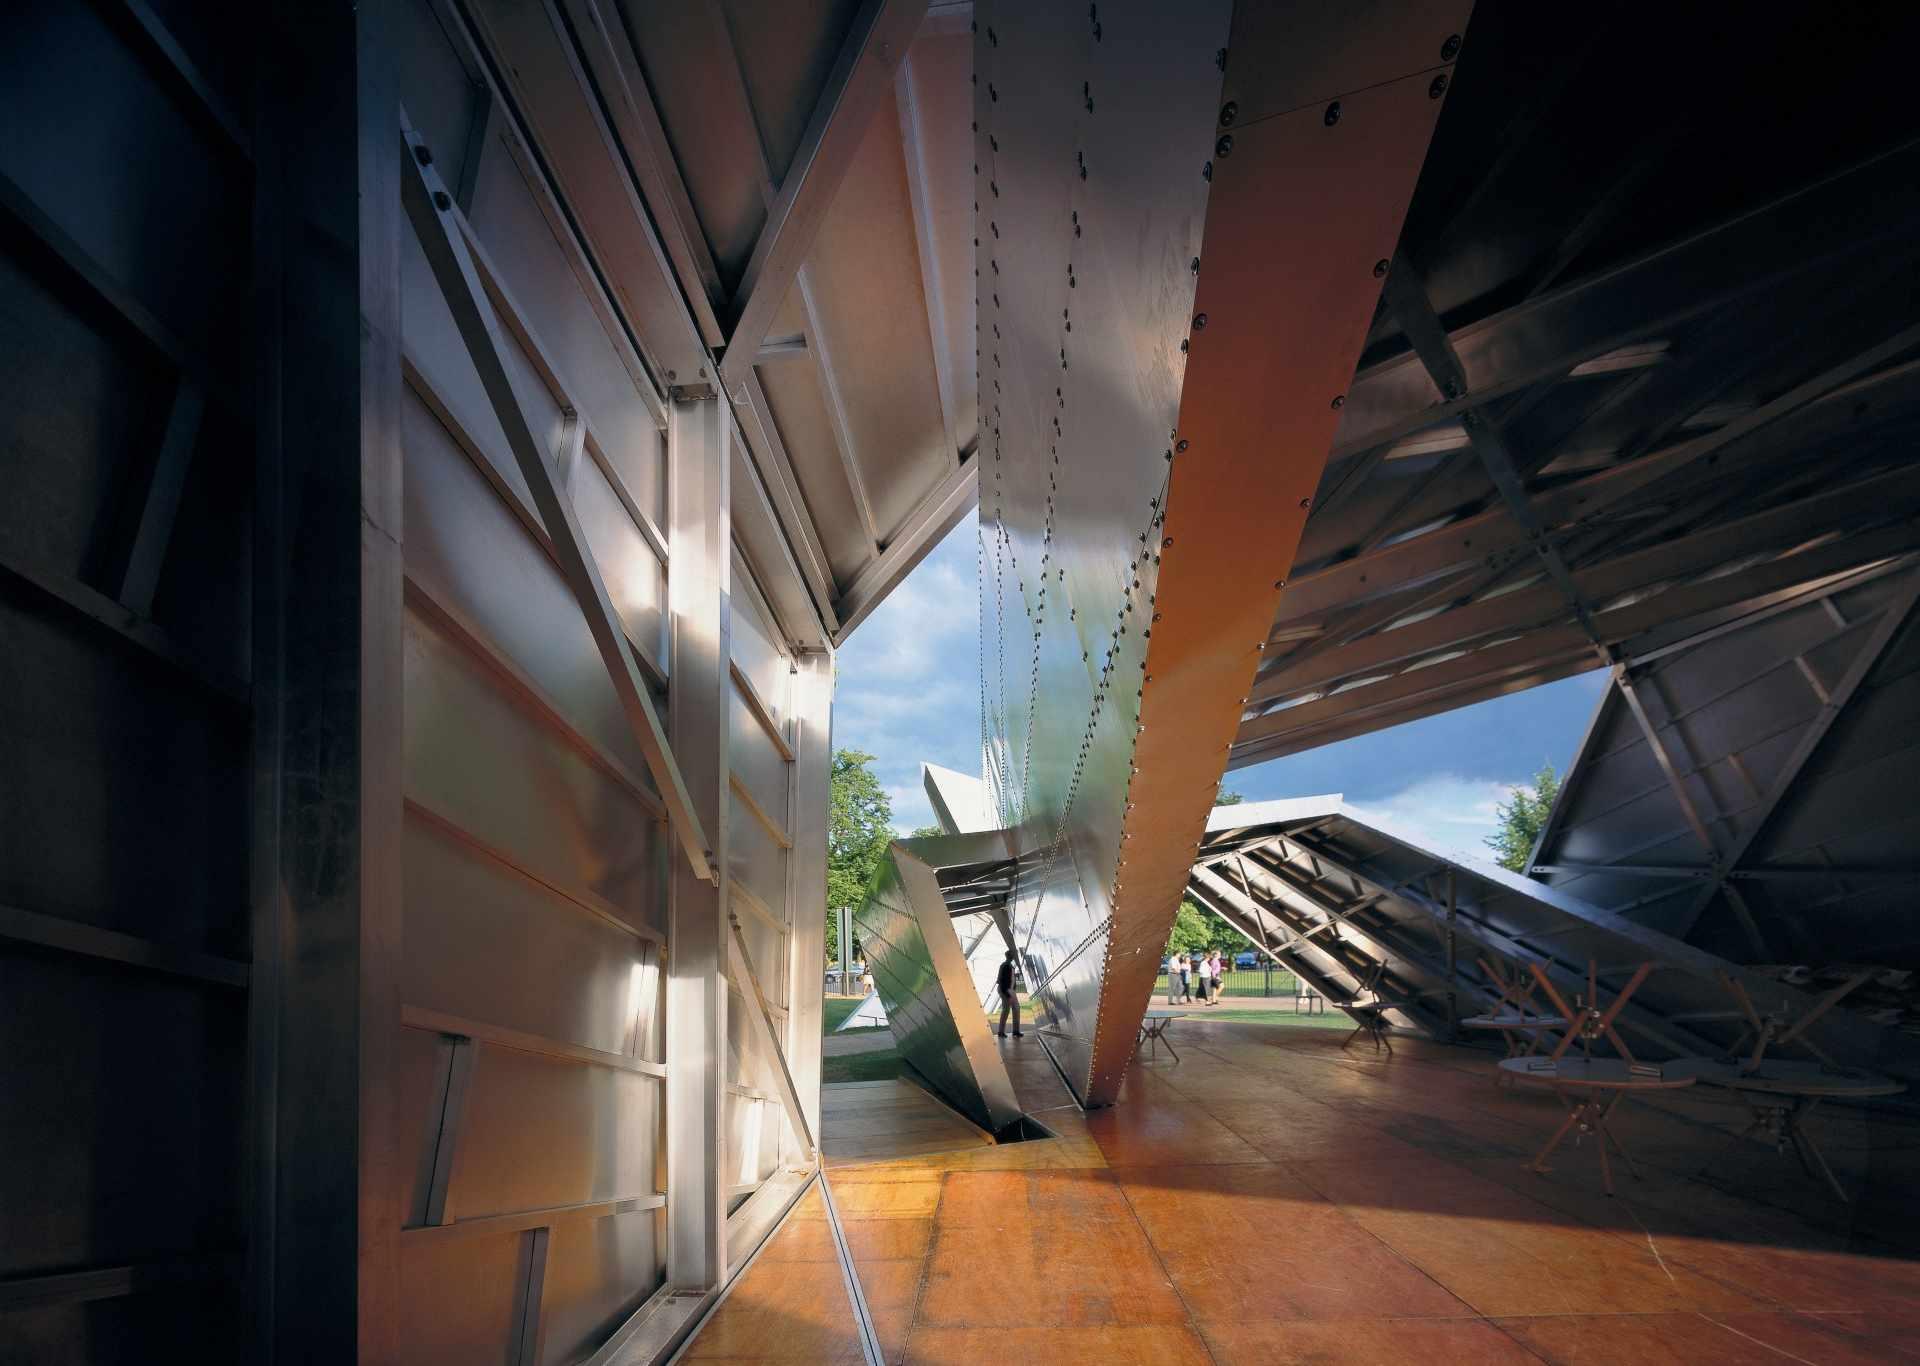 Serpentine Gallery 2001 by Daniel Libeskind